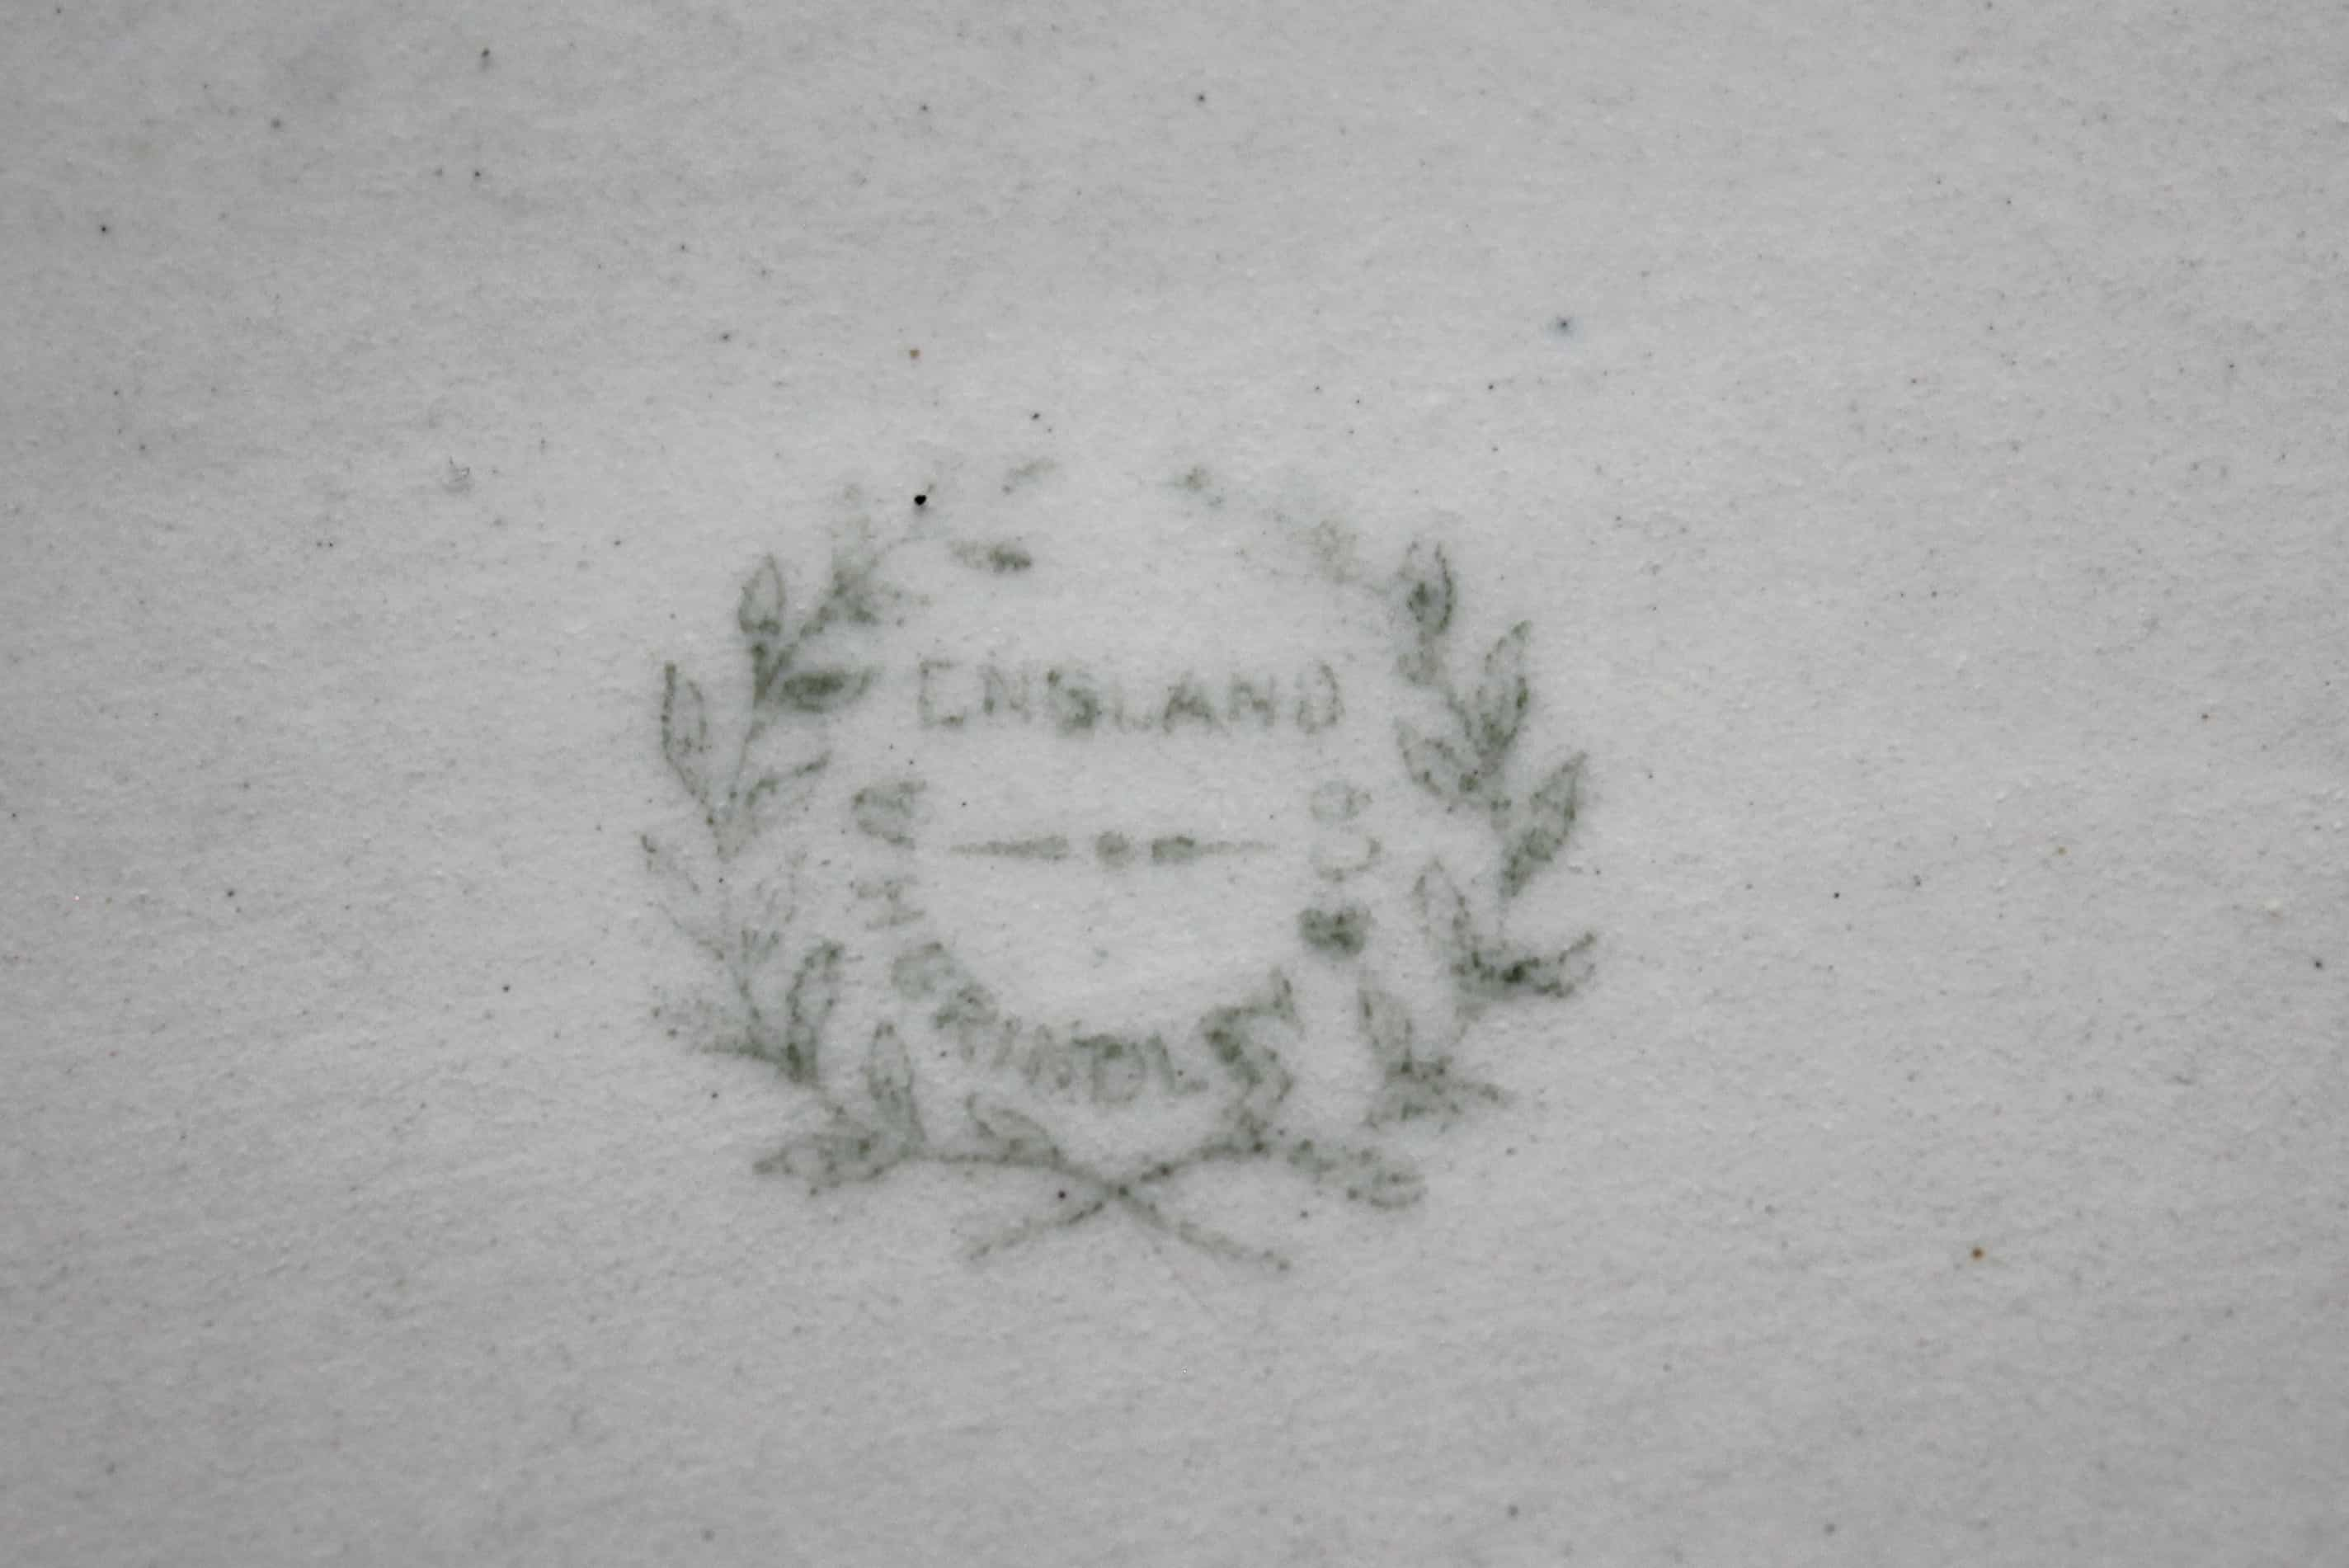 W.H. Grindley & Co. mark